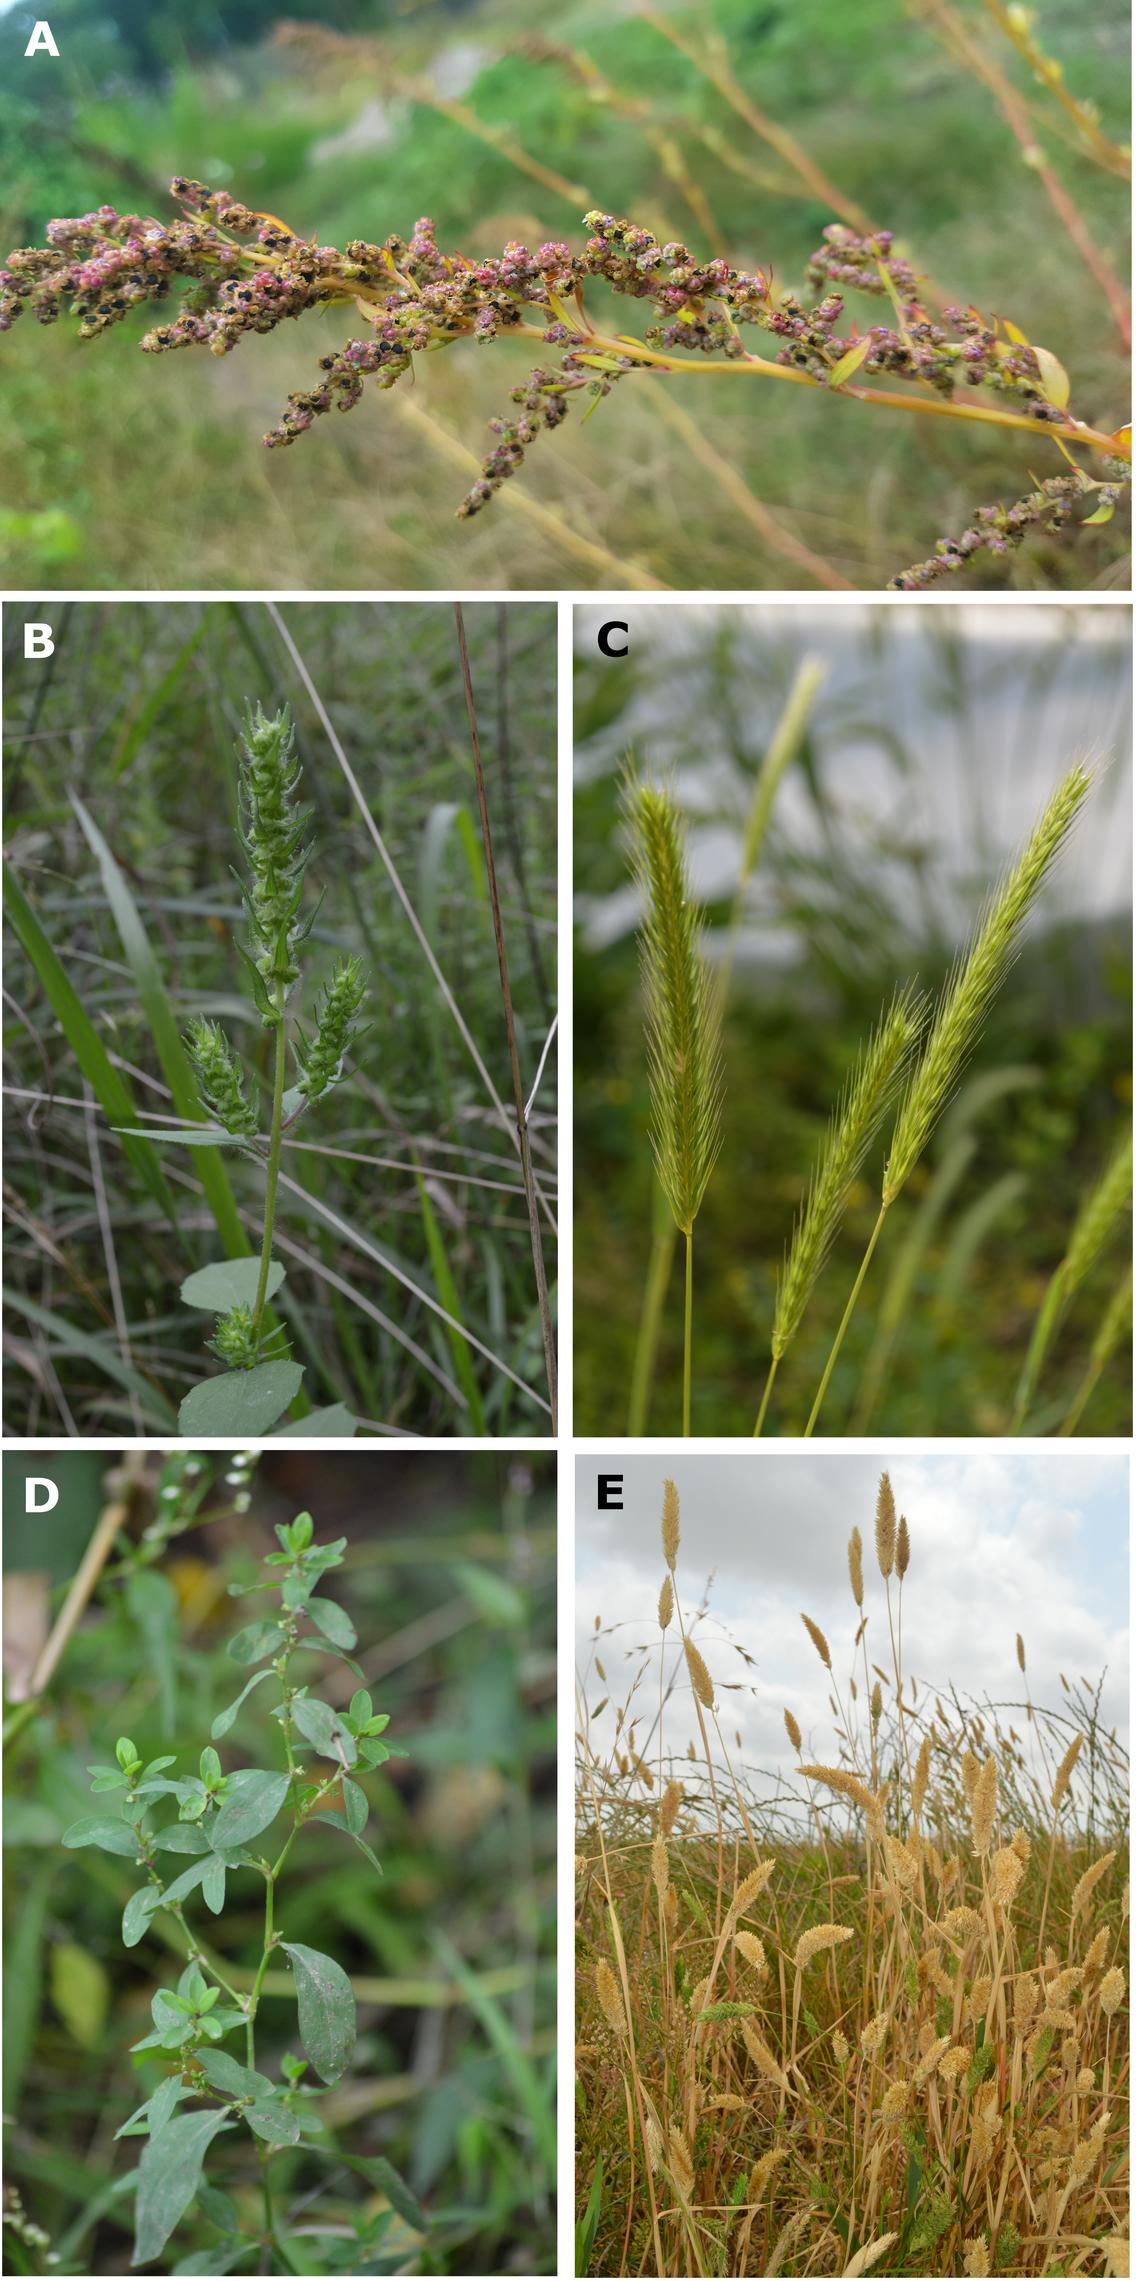 Here you can see some of the lost crops of North America: a) goosefoot (<em>Chenopodium berlandieri</em>); b) sumpweed/mars helder (<em>Iva annua</em>); c) little barley (<em>Hordeum pusillum</em>); d) erect knotweed (<em>Polygonum erectum</em>); e) maygrass (<em>Phalaris caroliniana</em>)